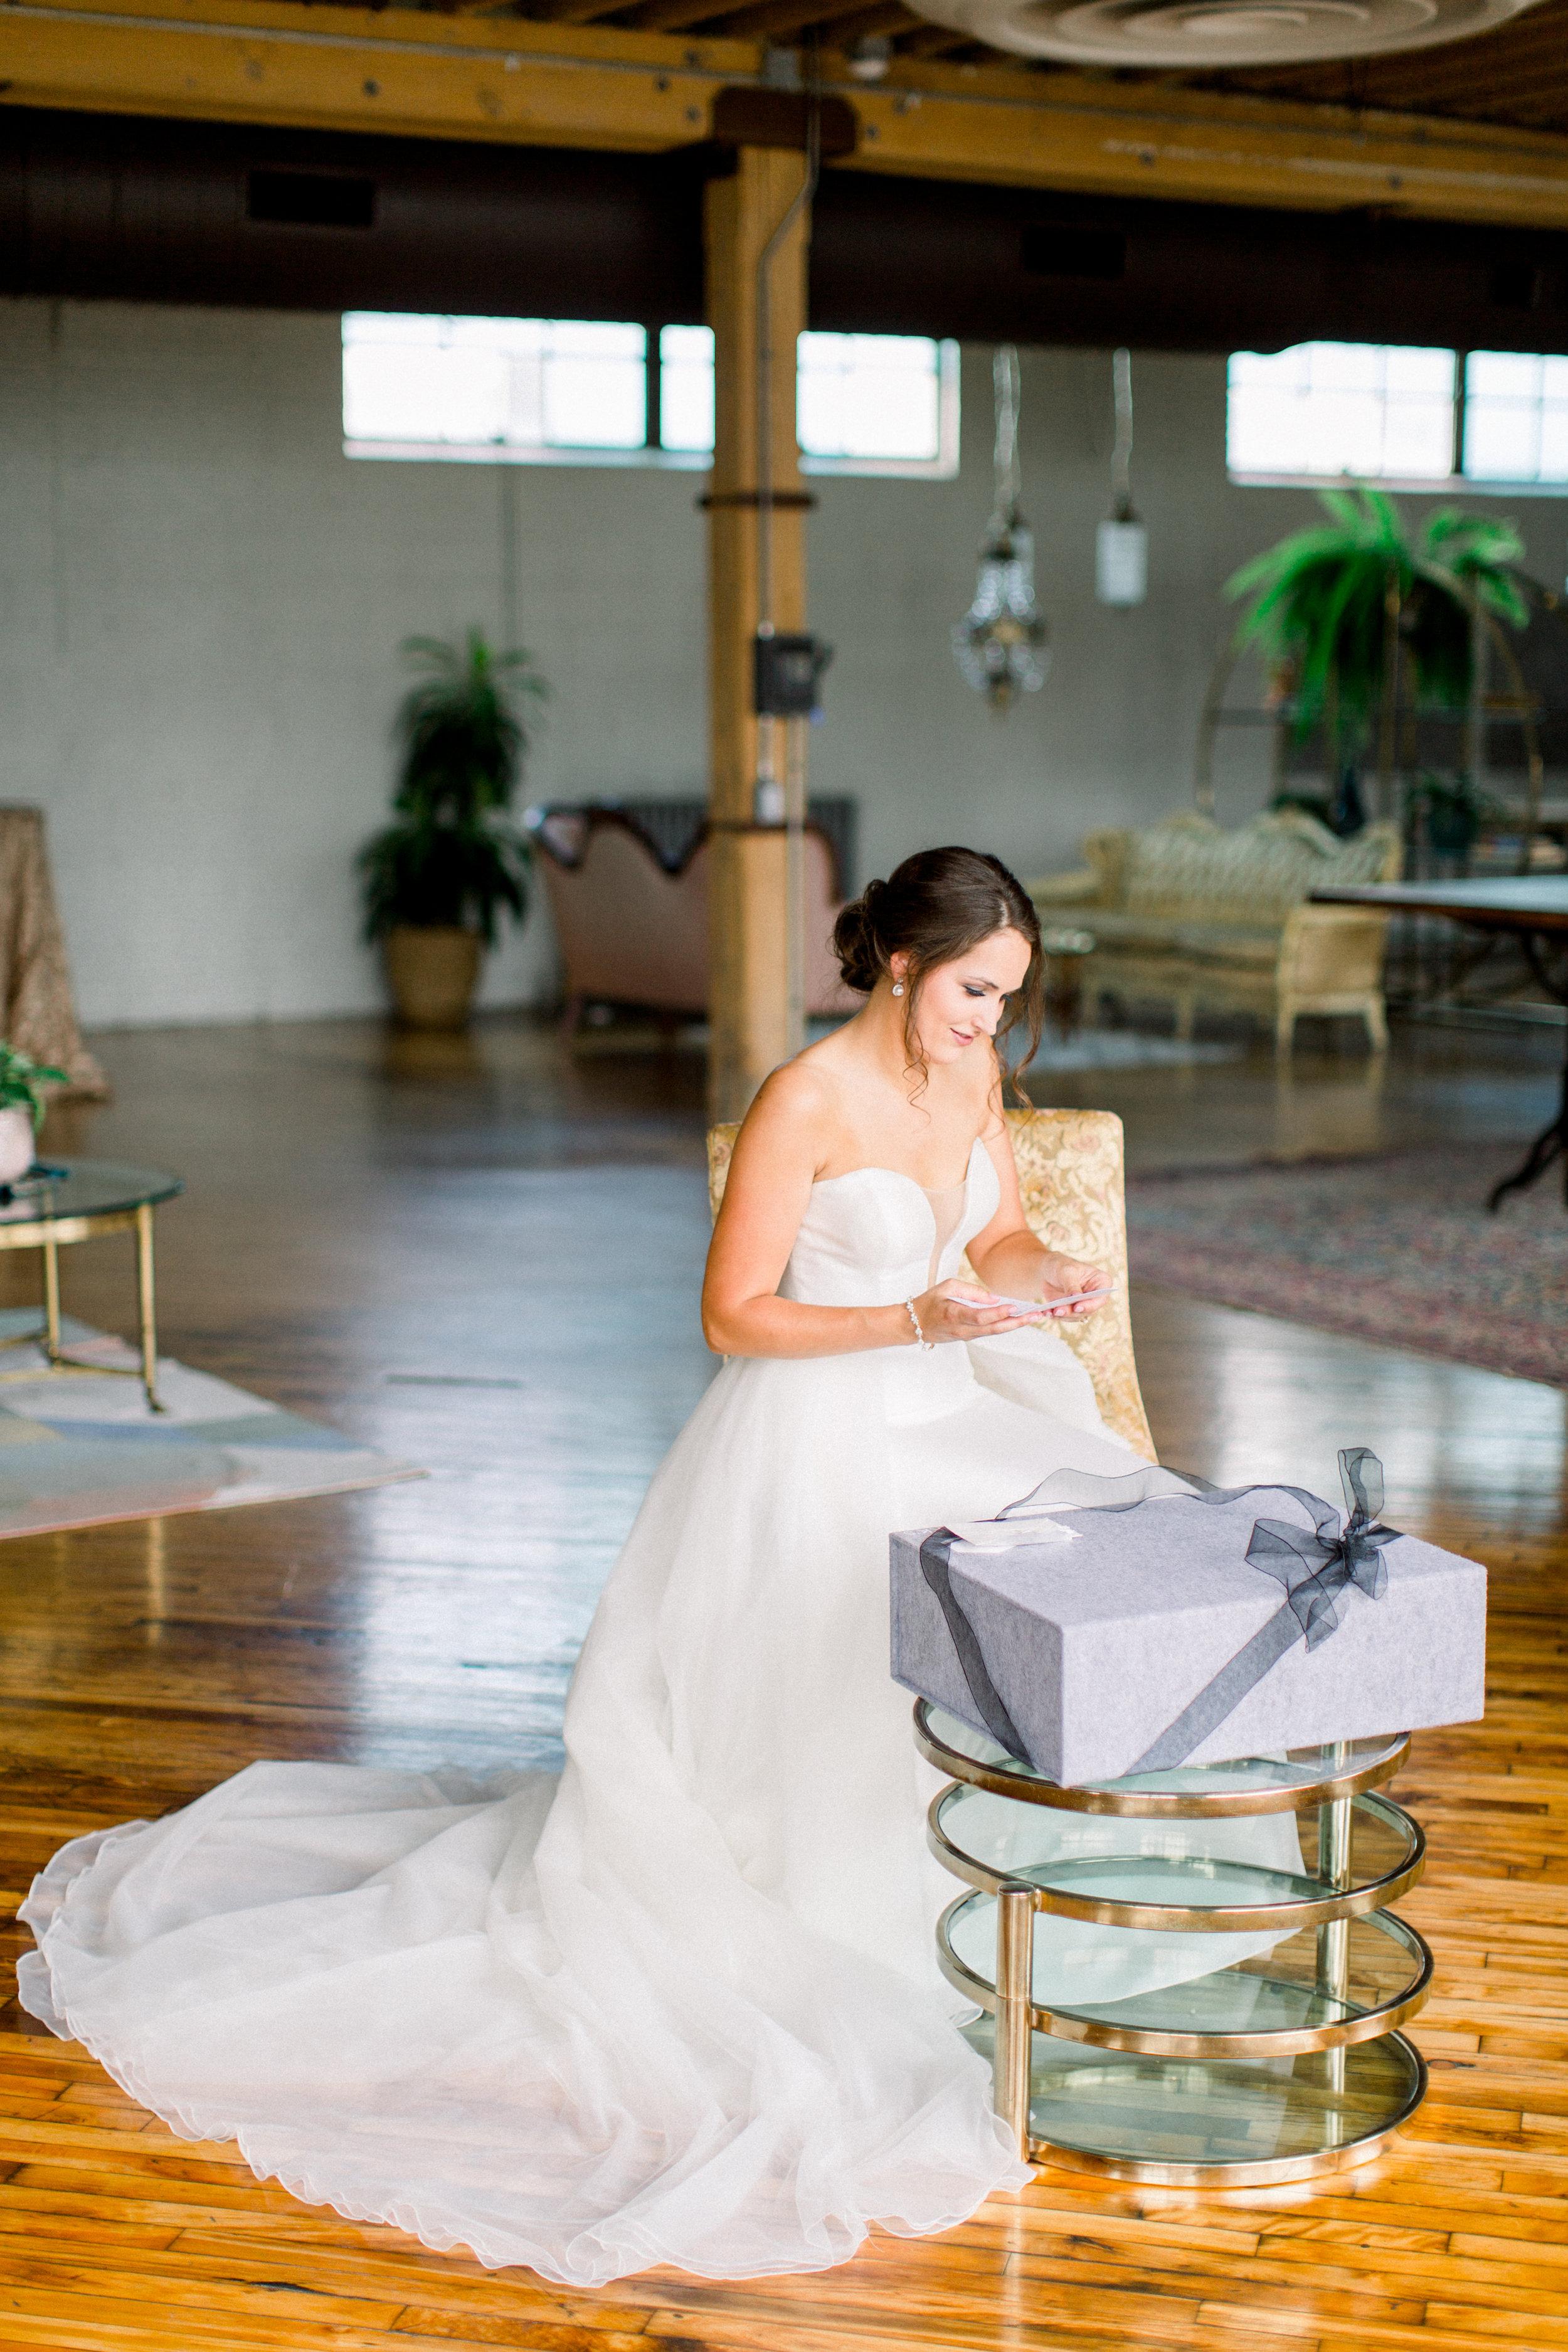 Steiner+Wedding+Bride+Getting+Dressed-66.jpg